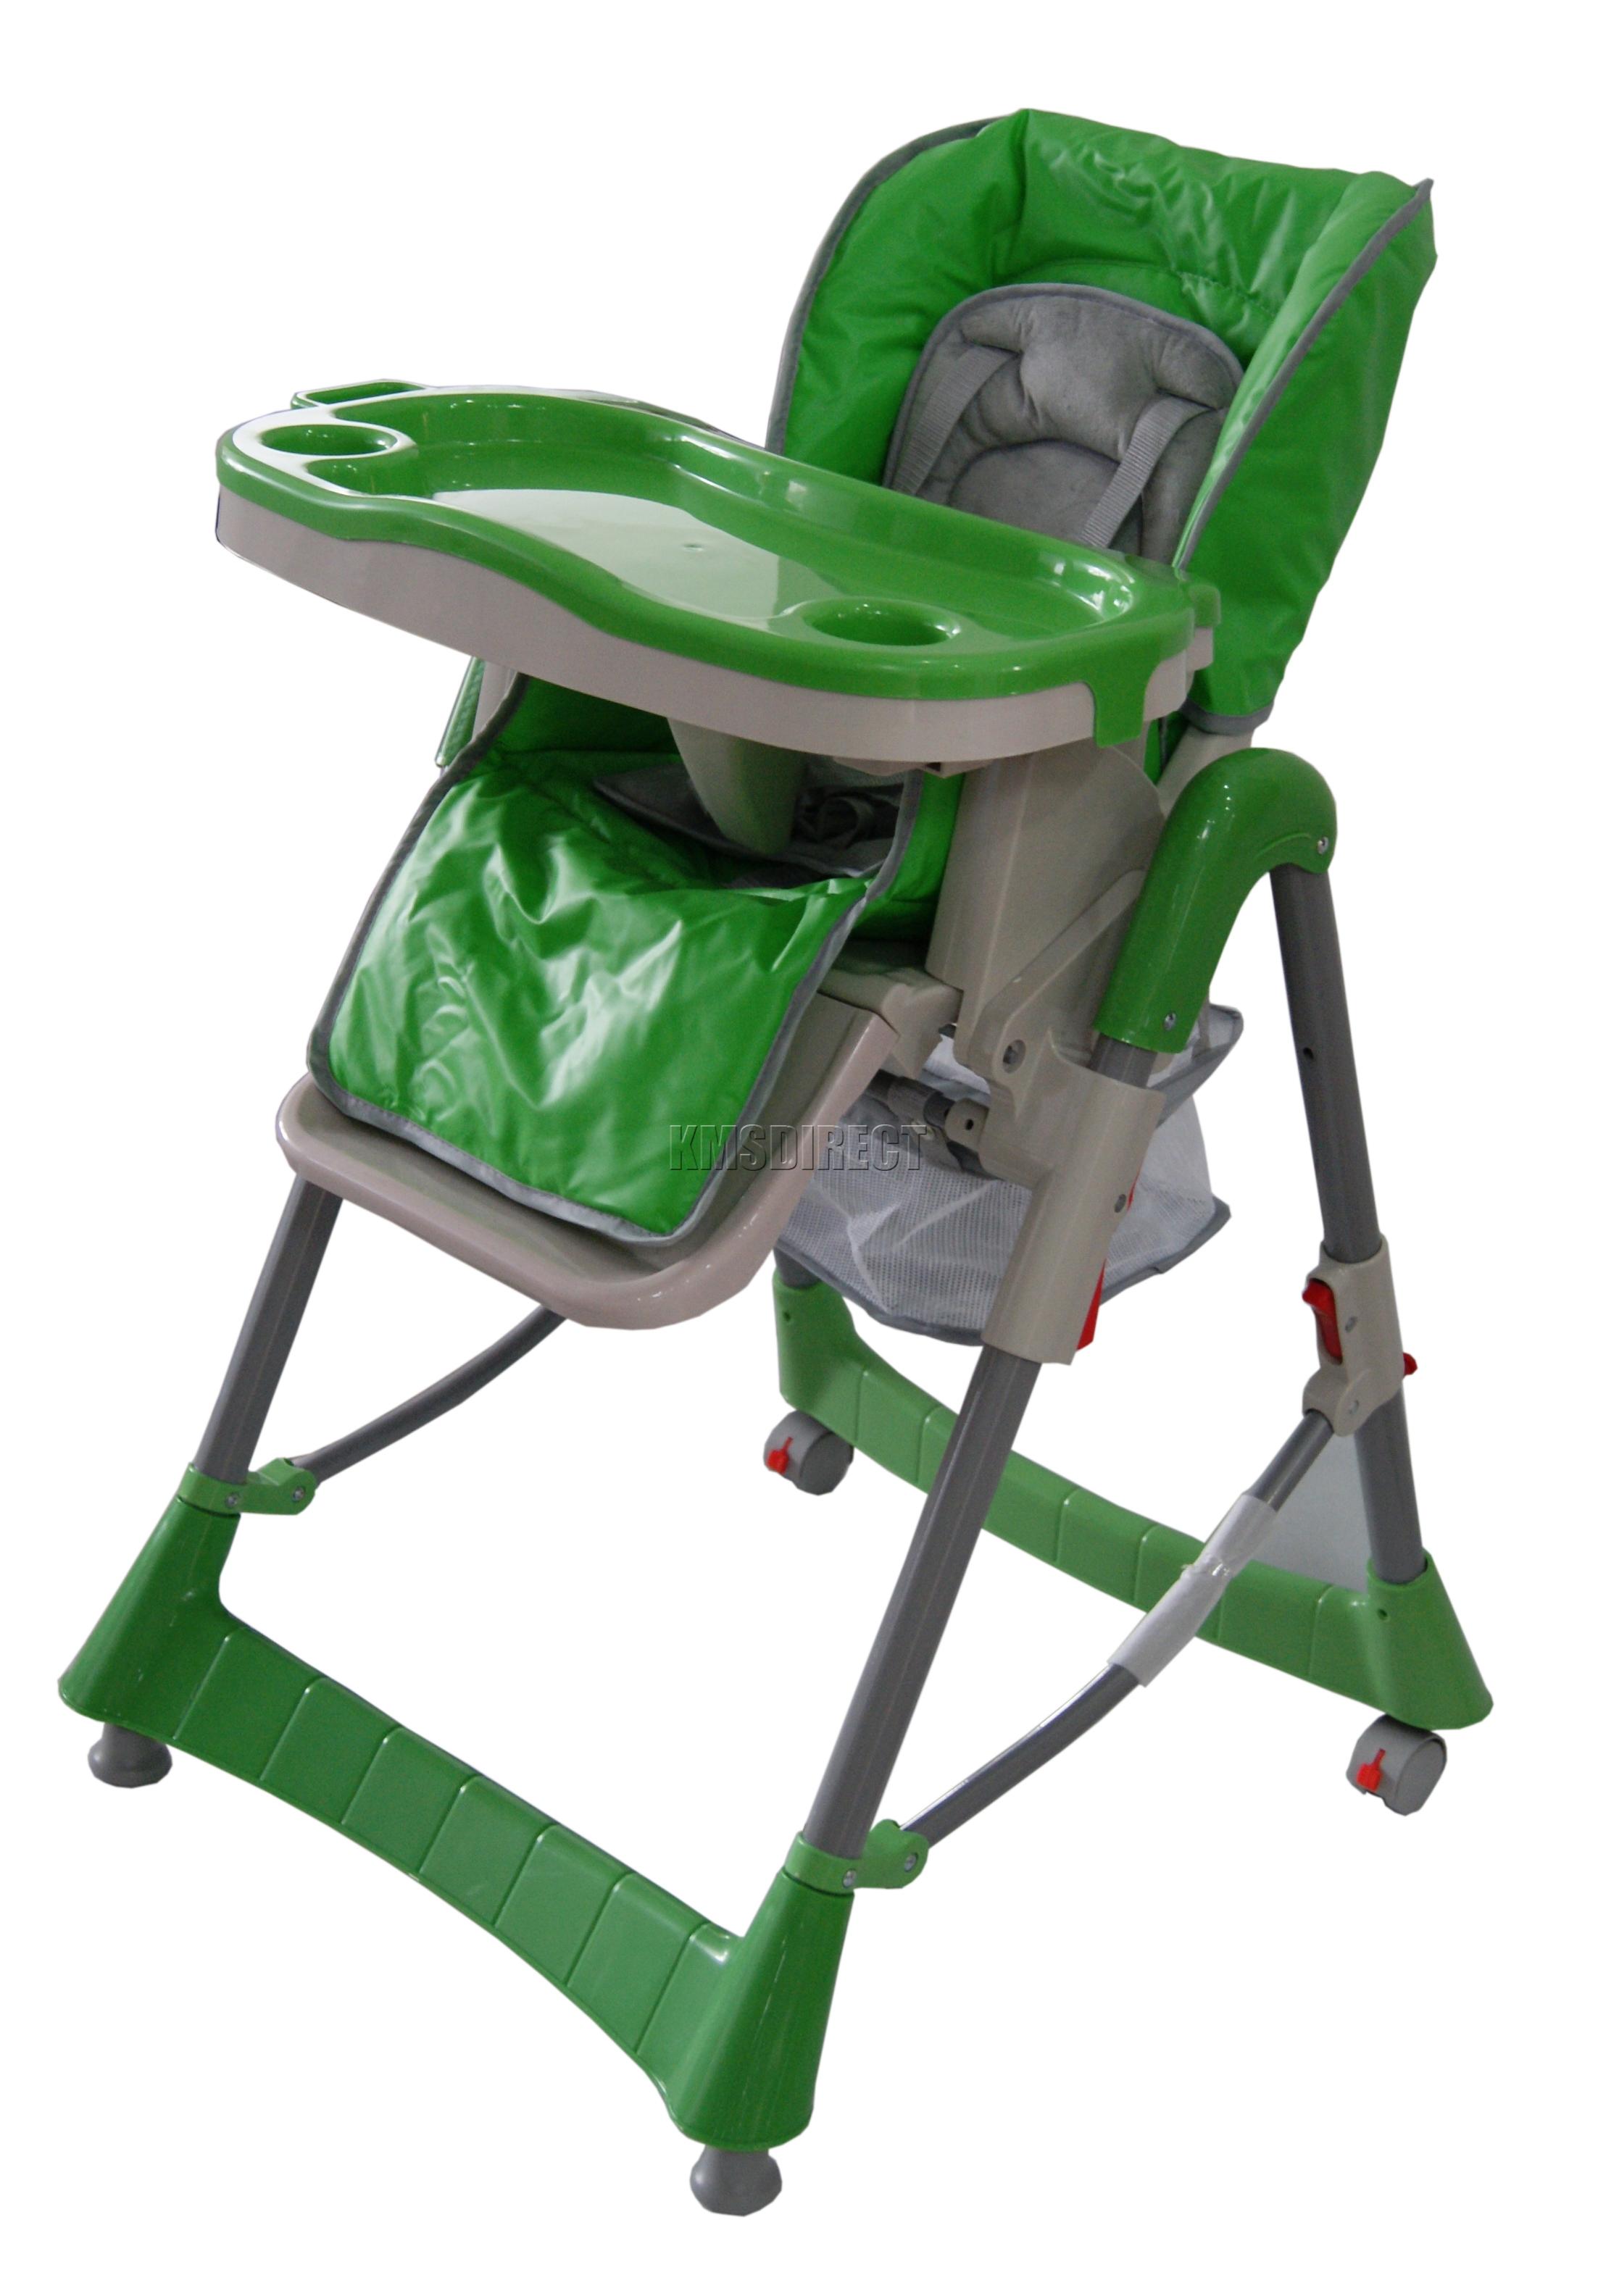 Height Adjustable Baby High Chair Recline Highchair